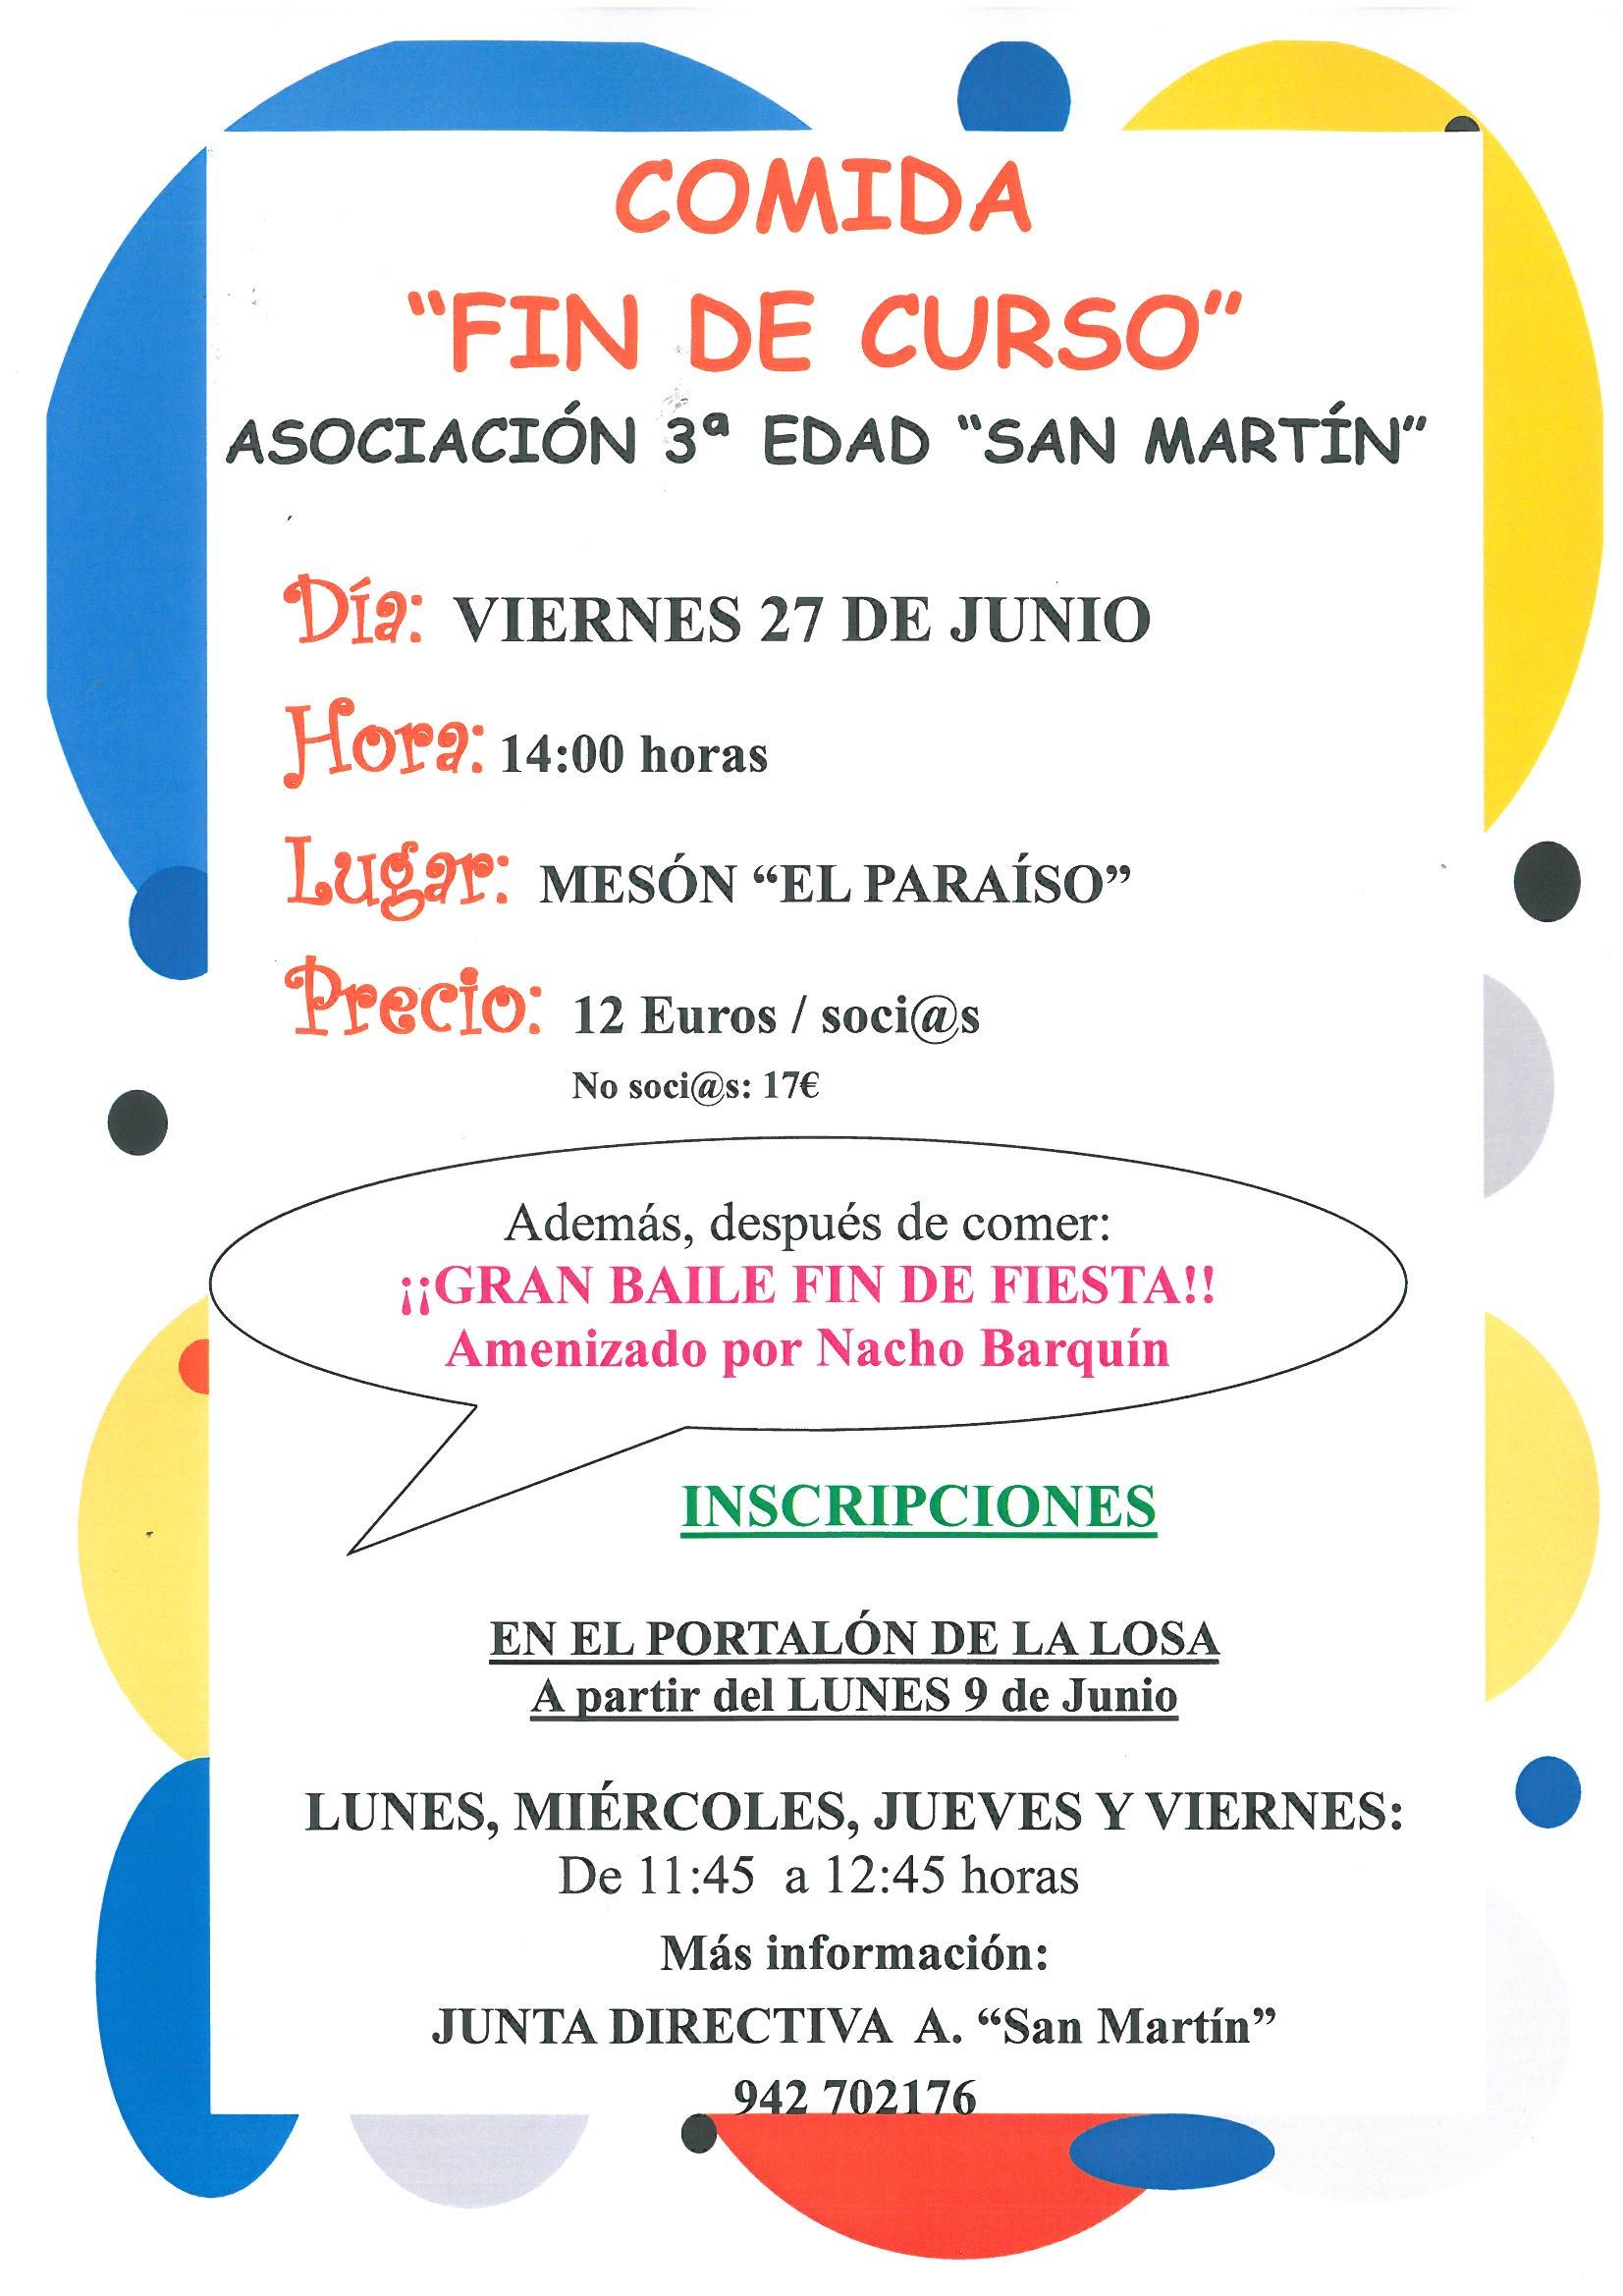 http://www.cabezondelasal.net/wp-content/uploads/2014/06/Cartel-Comida-Fin-de-Curso-San-Martin-Junio-2014.jpg